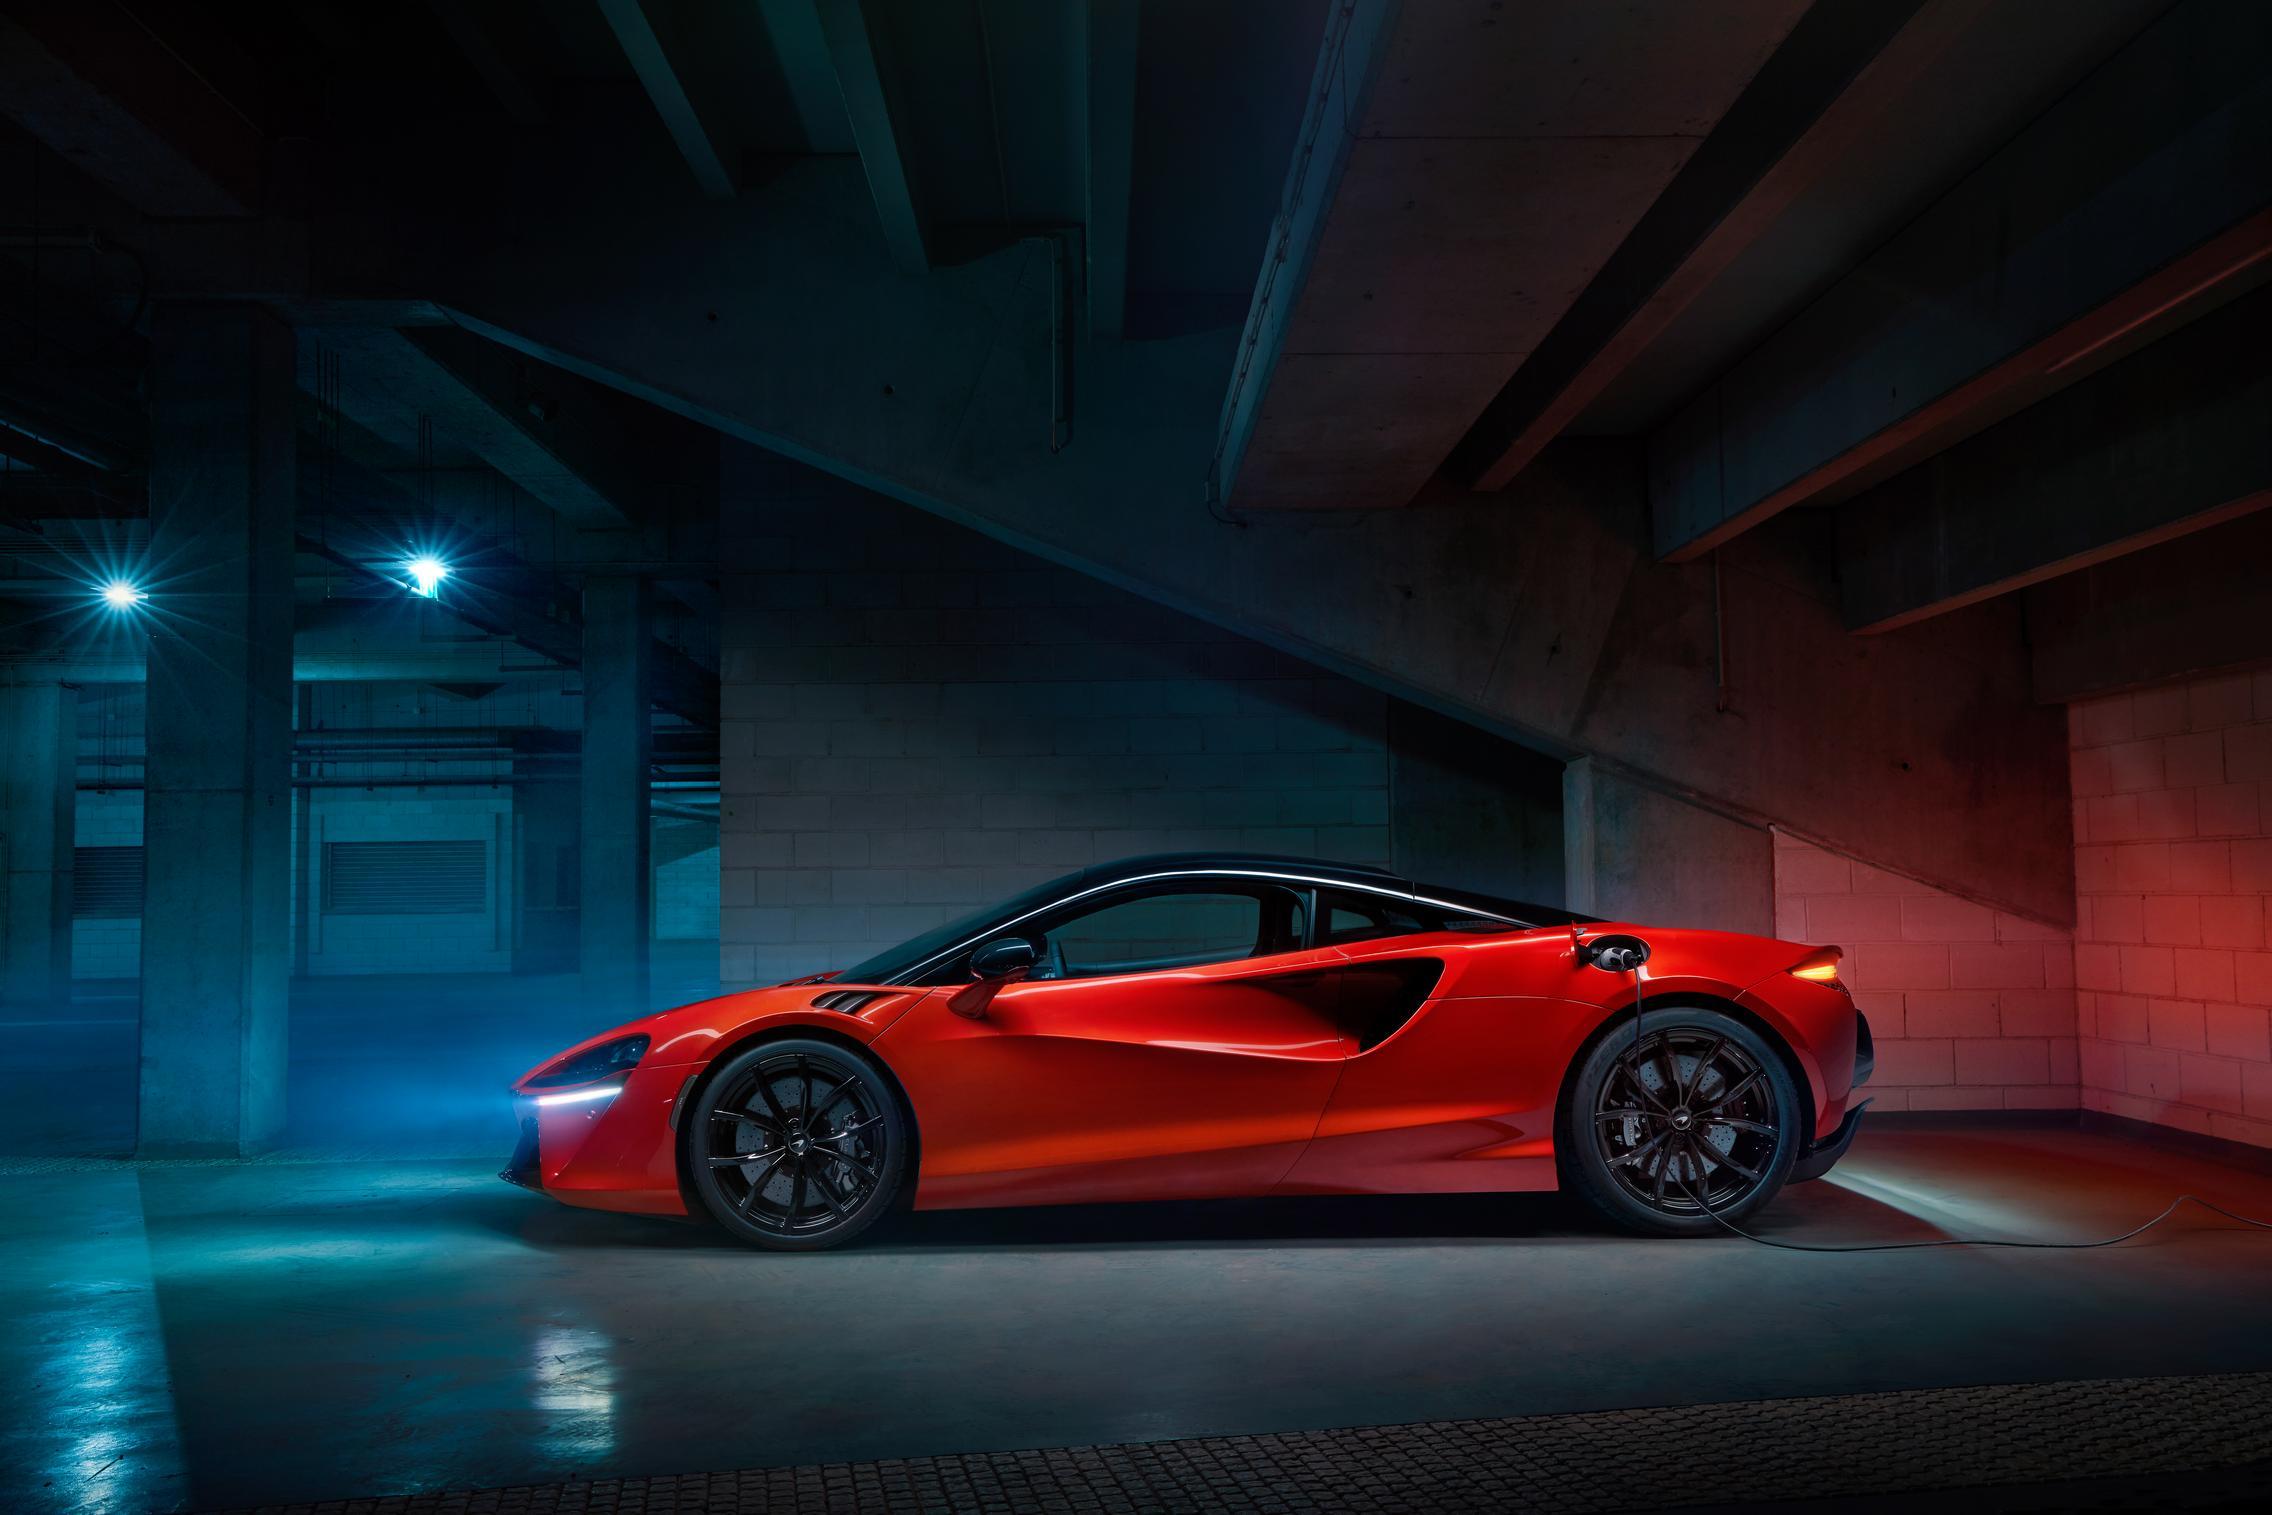 McLaren Artura side